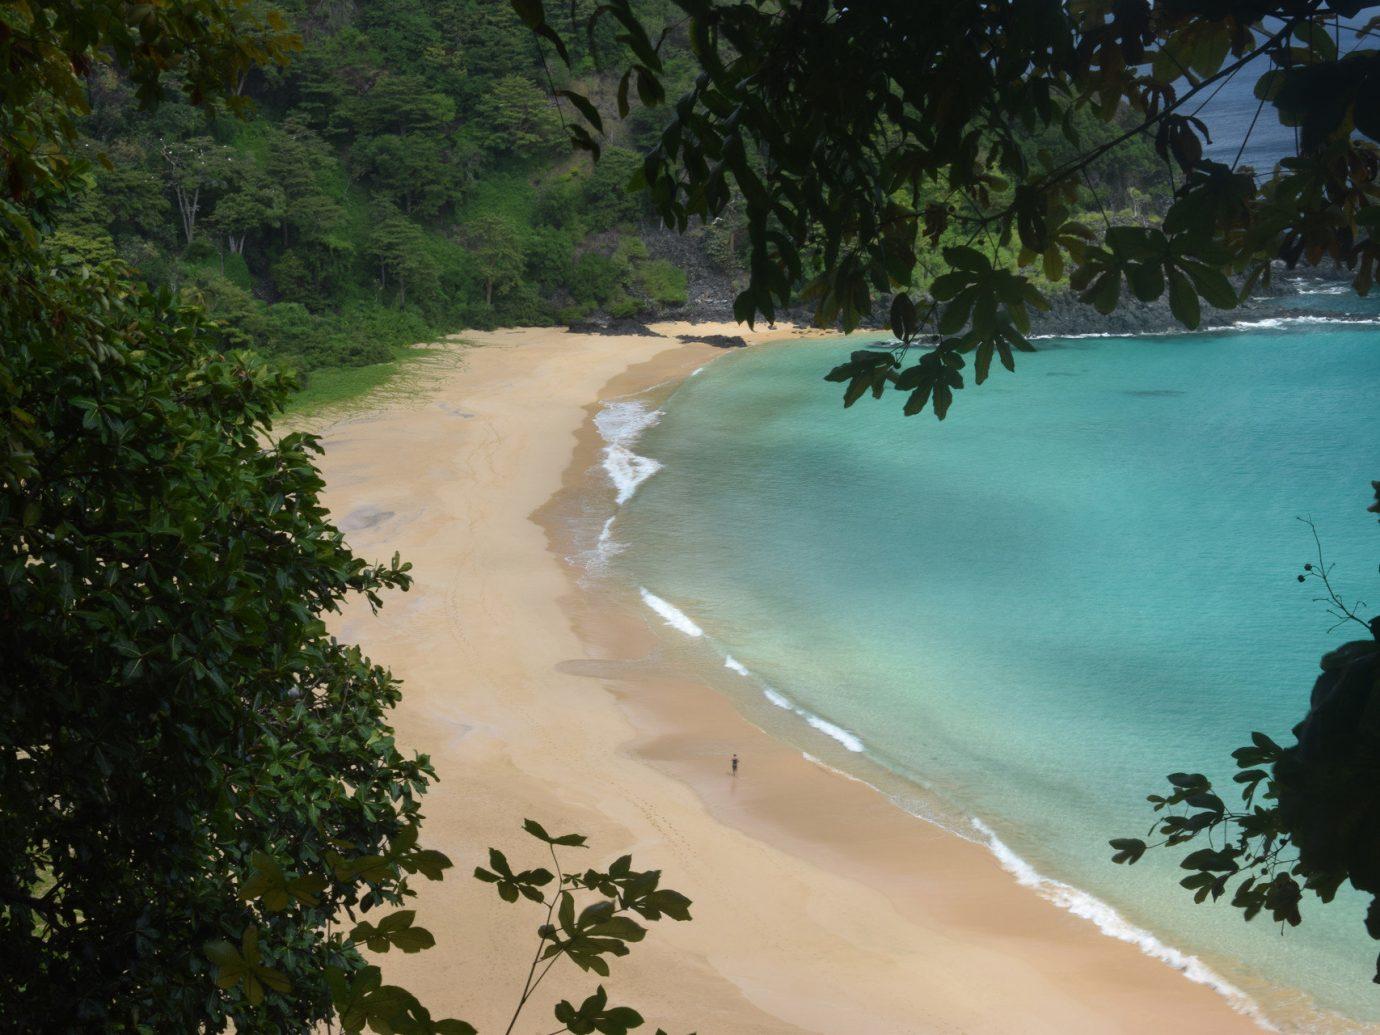 Trip Ideas tree outdoor landform body of water water Beach River Nature Coast tropics bay Jungle Sea plant shore